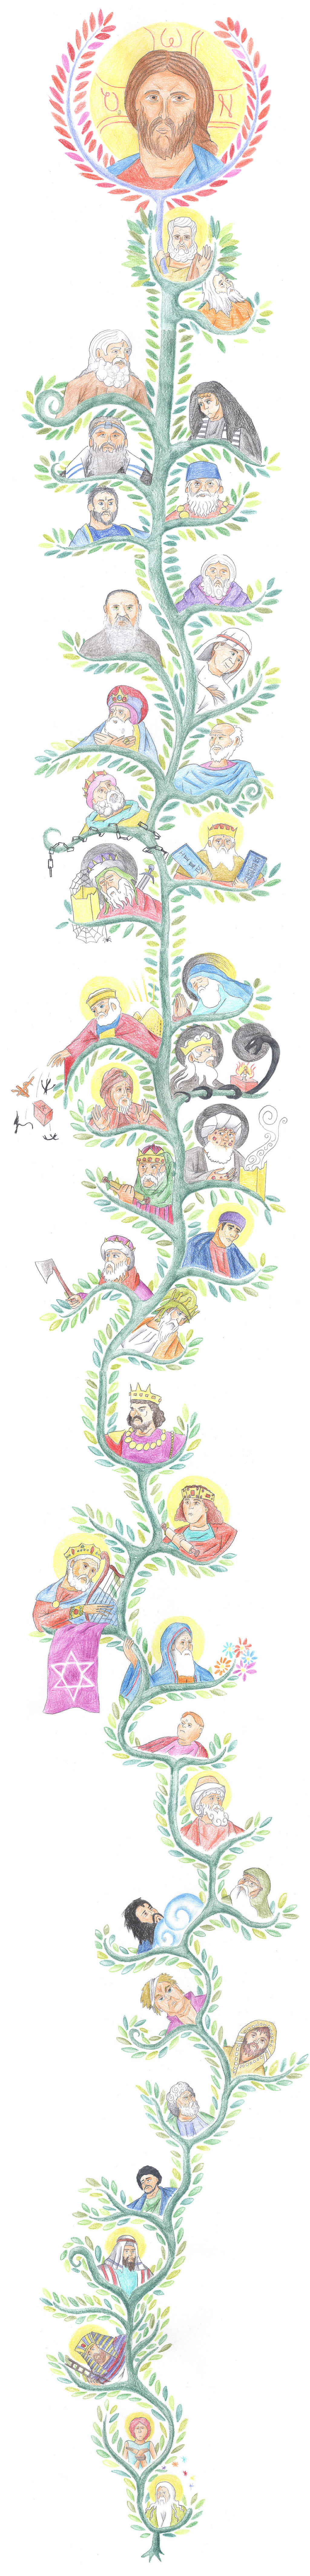 Matthew 1 - Genealogy of Christ (Tree of Jesse) by Parastos